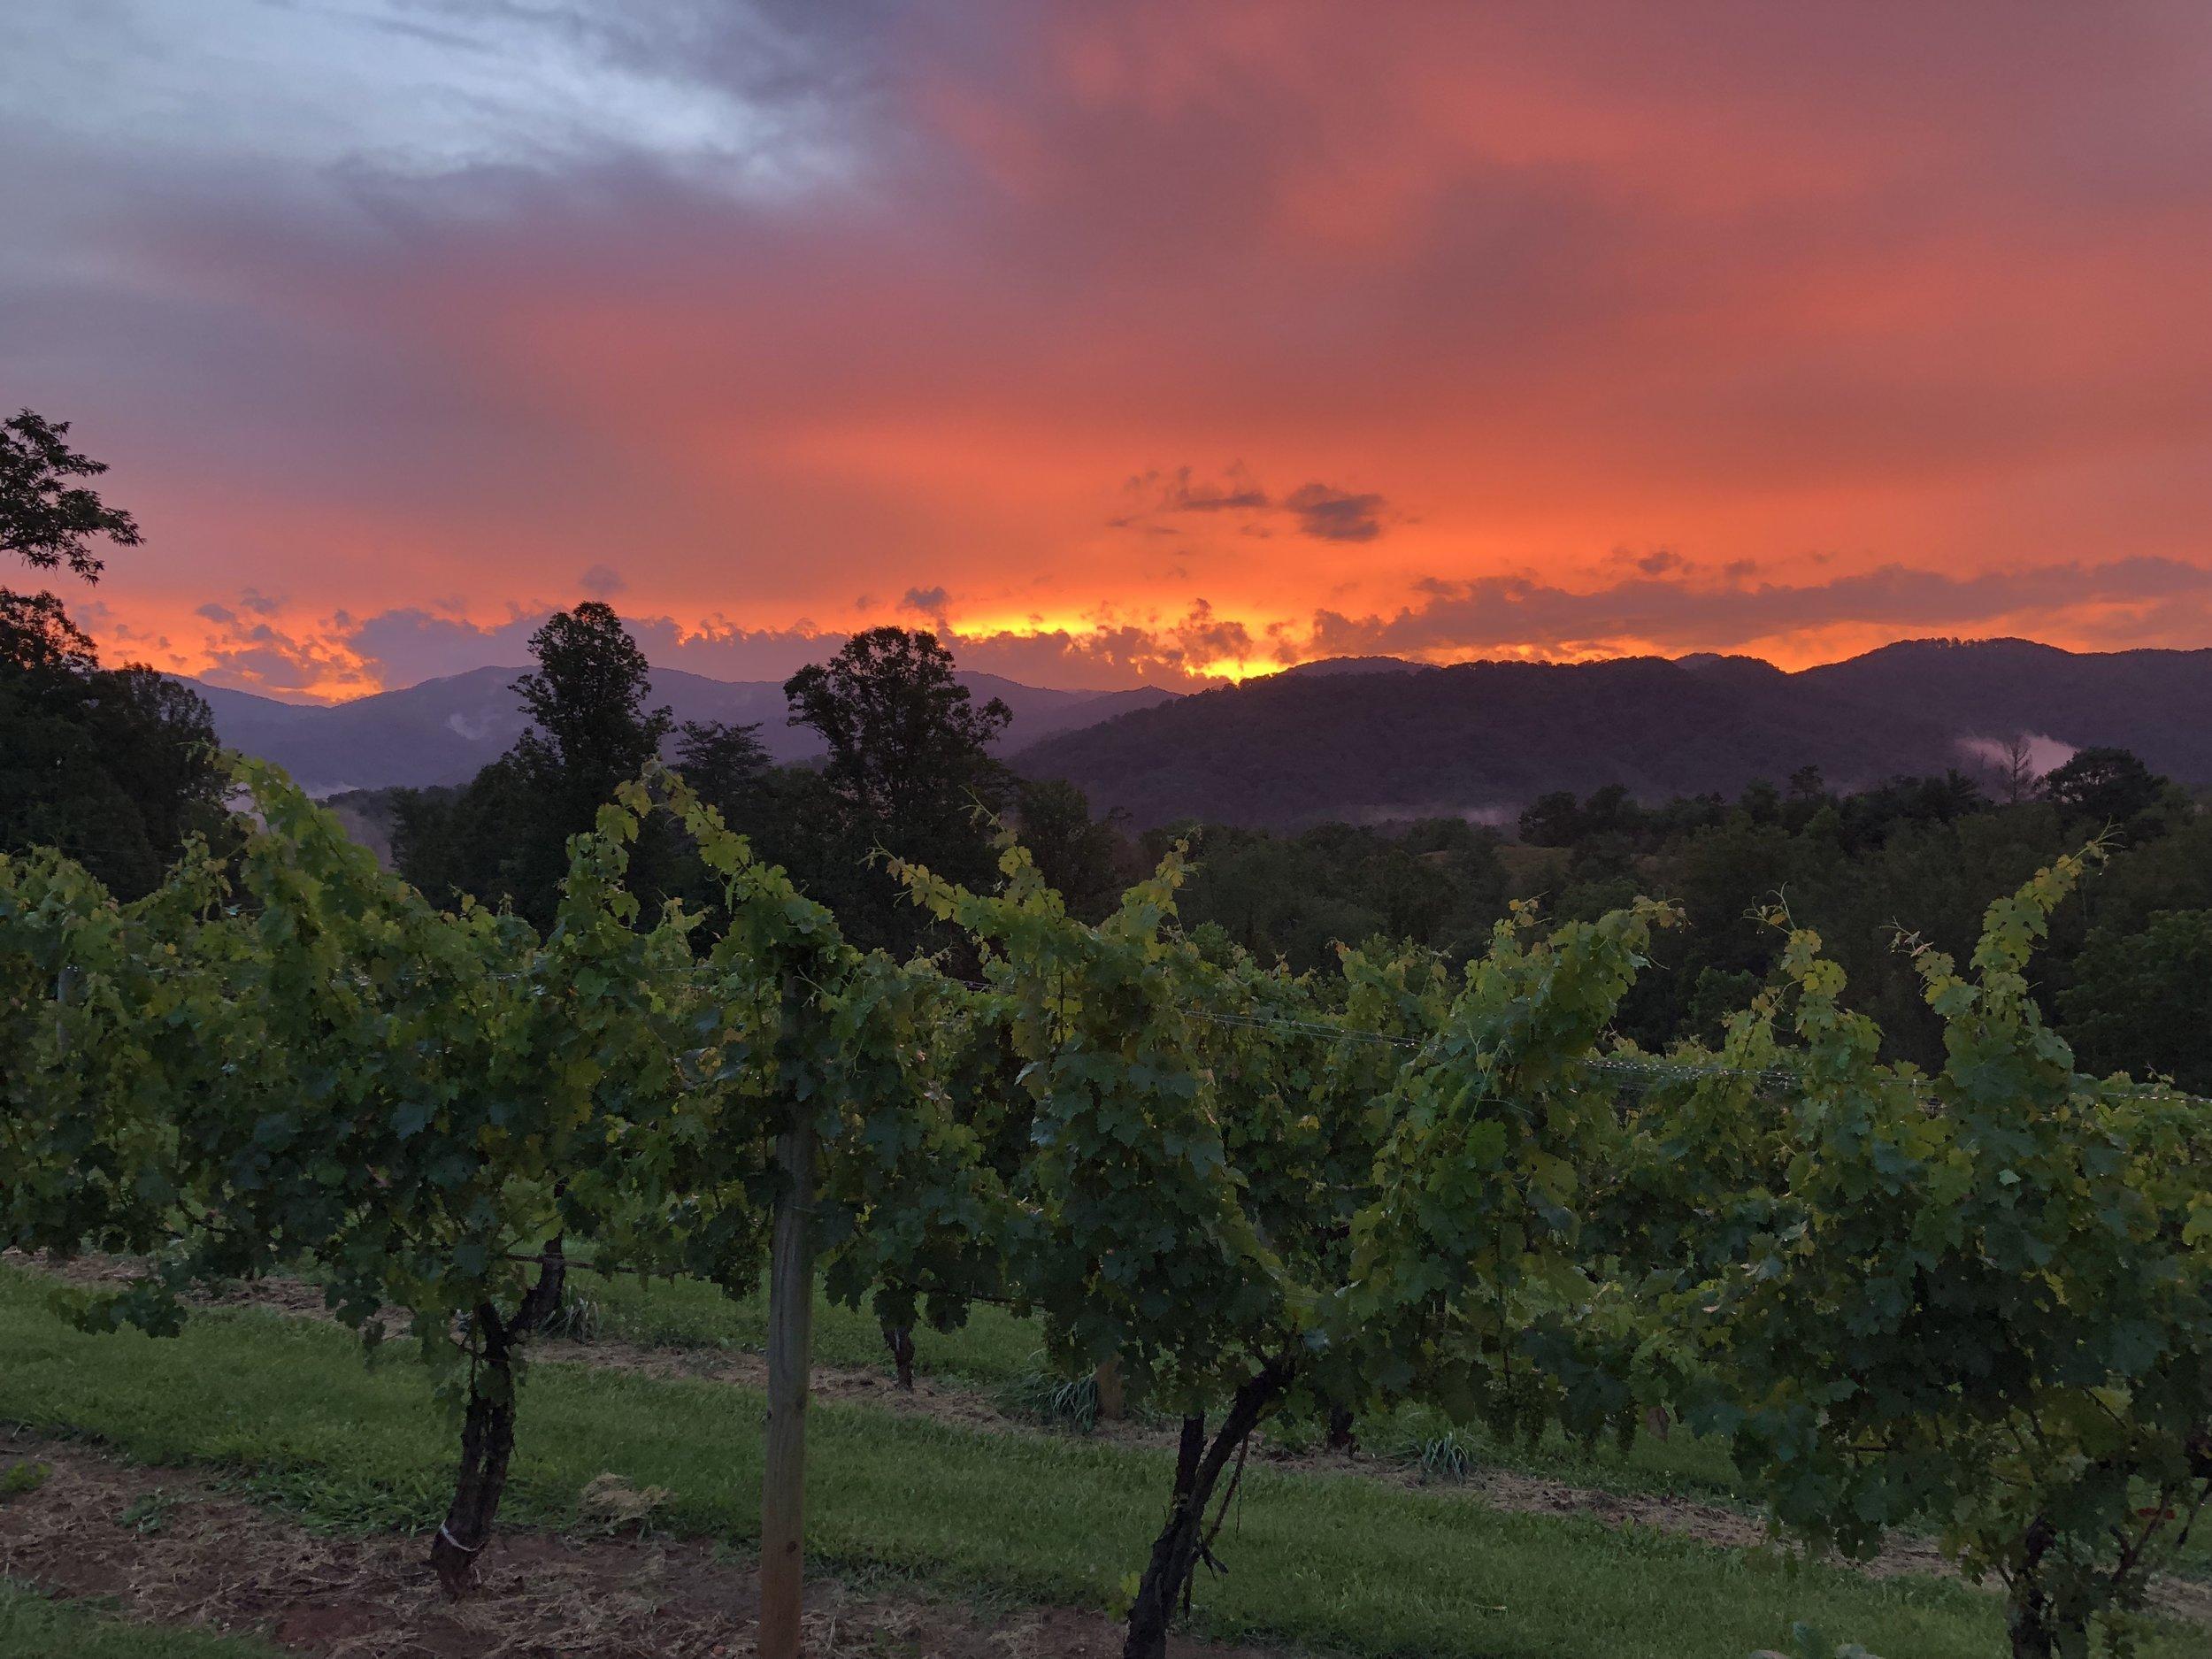 Sunset over the vineyard, 24 June 2019